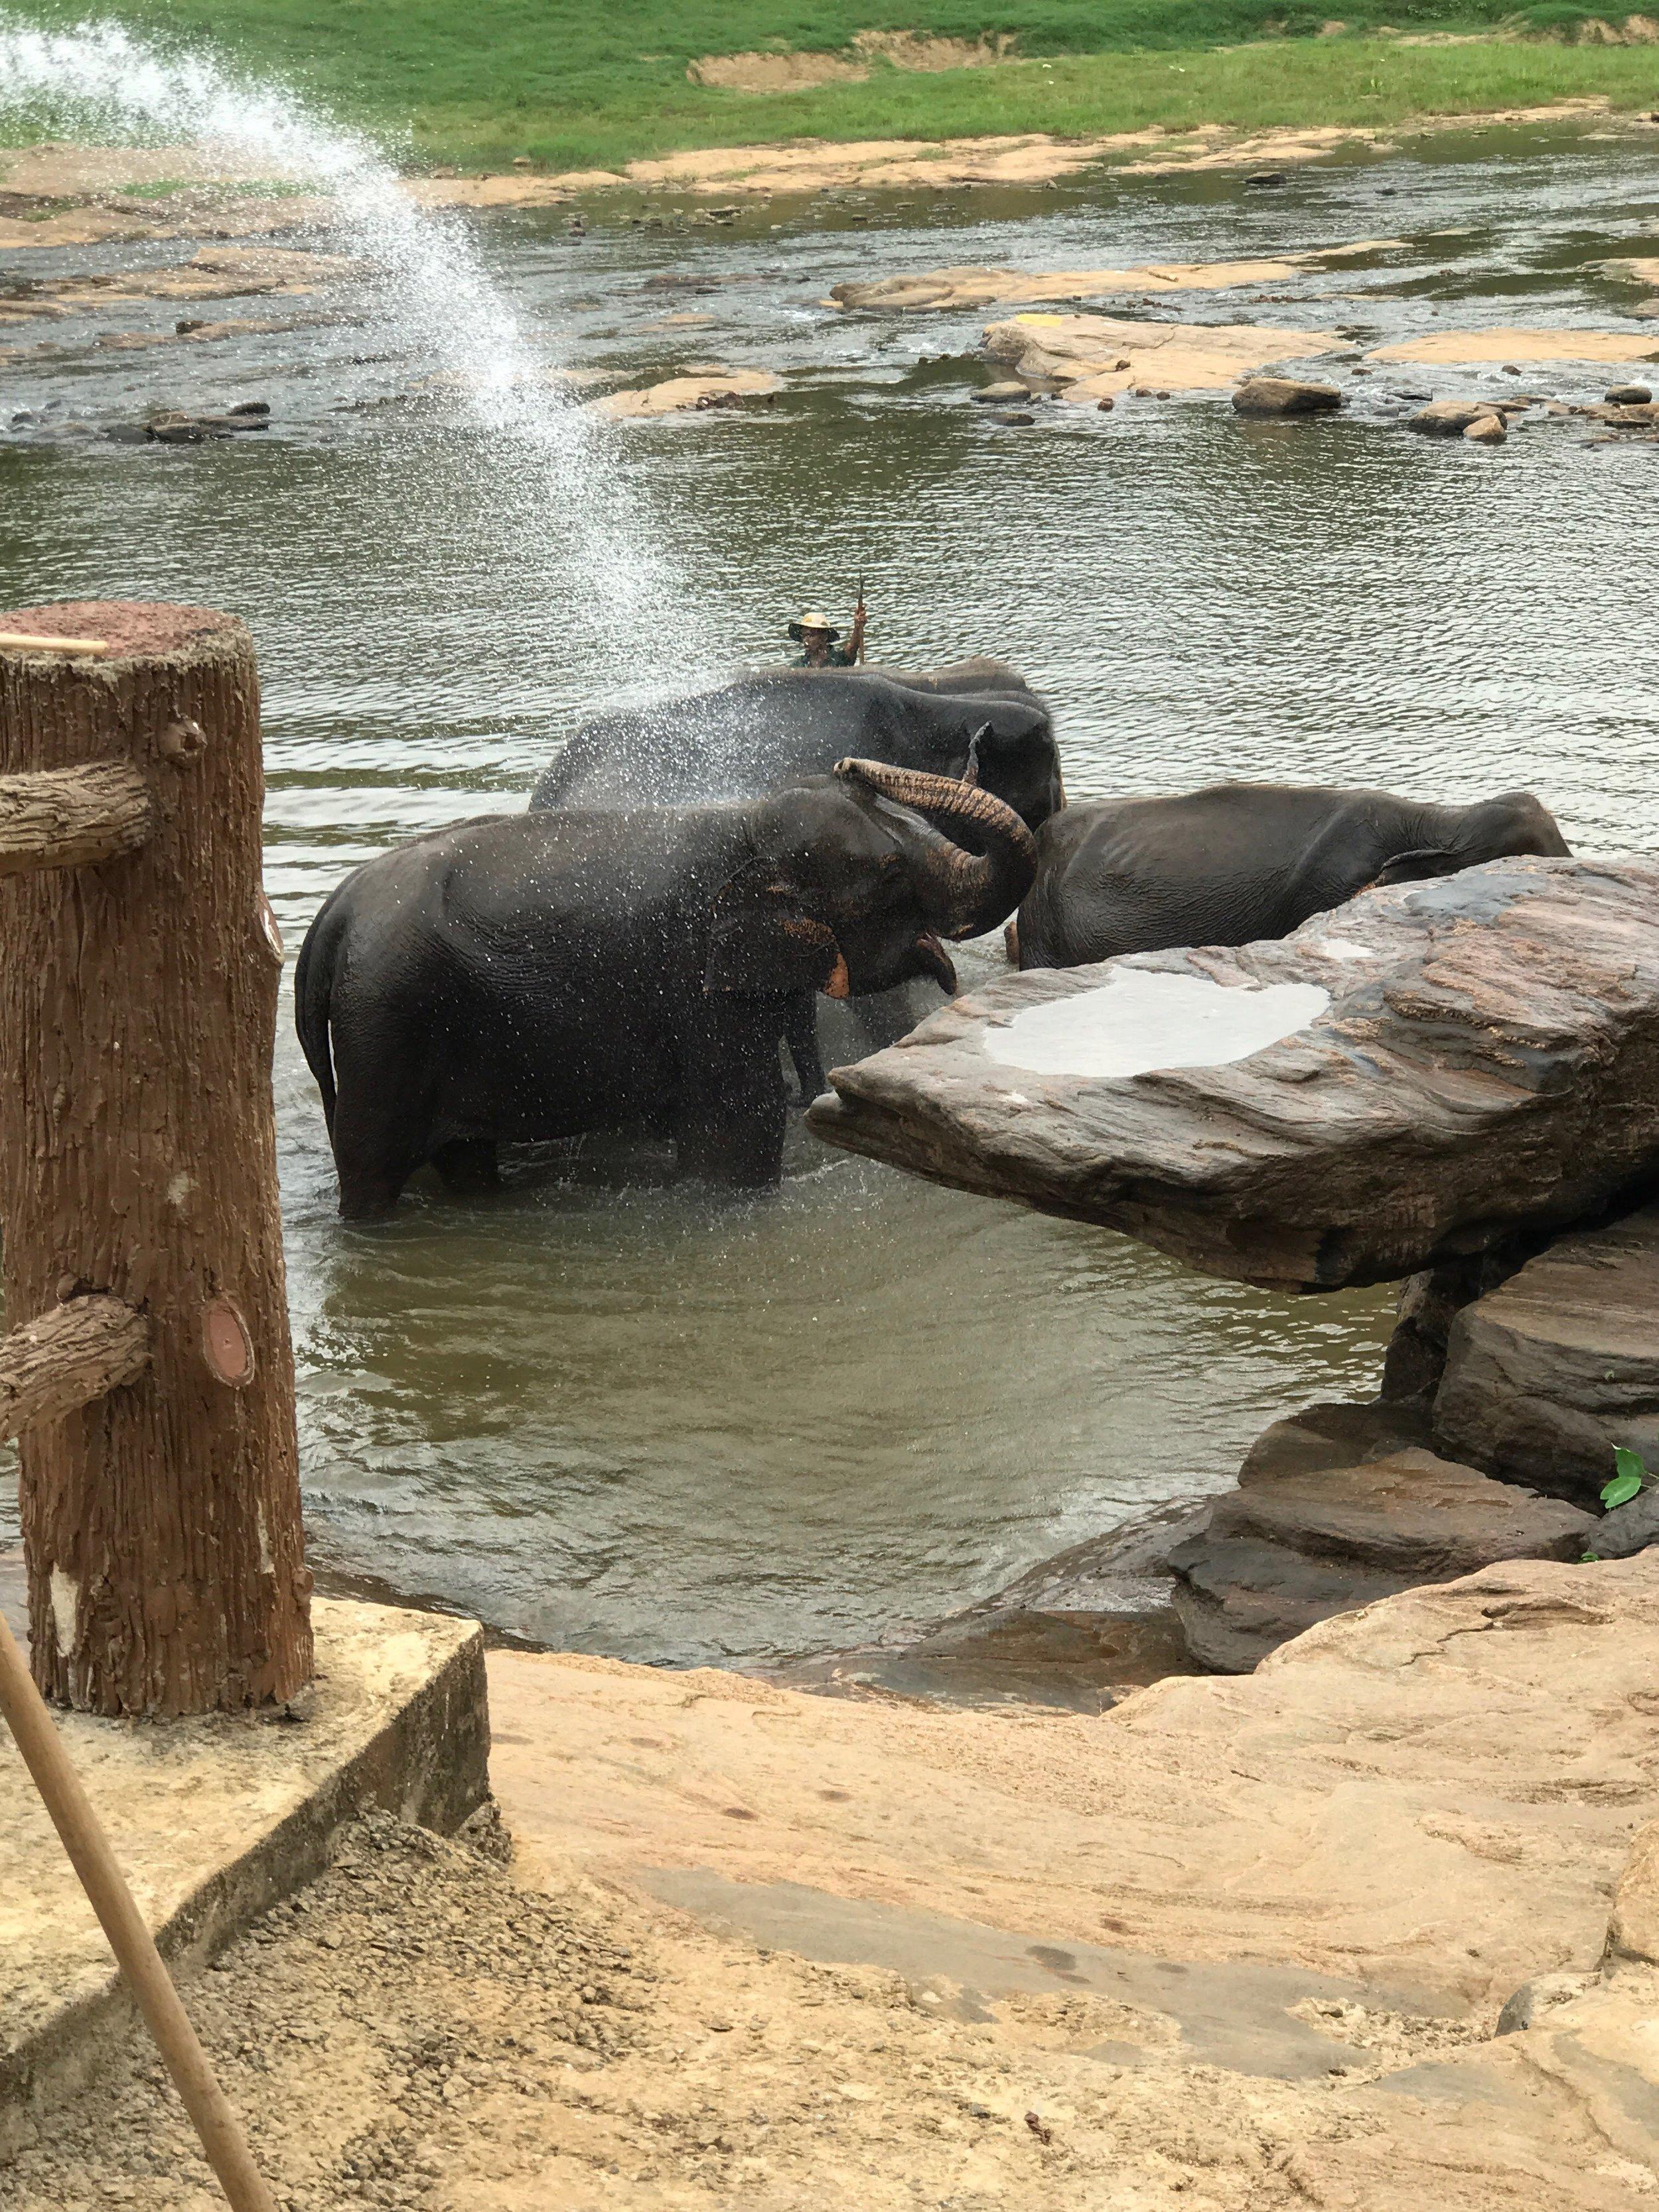 invite-to-paradise-maldives-sri-lanka-specialists-experts-travel-agent-tour-operator-customer-feedback-lucas-emily-fenning-elephant-orphanage-2.jpg